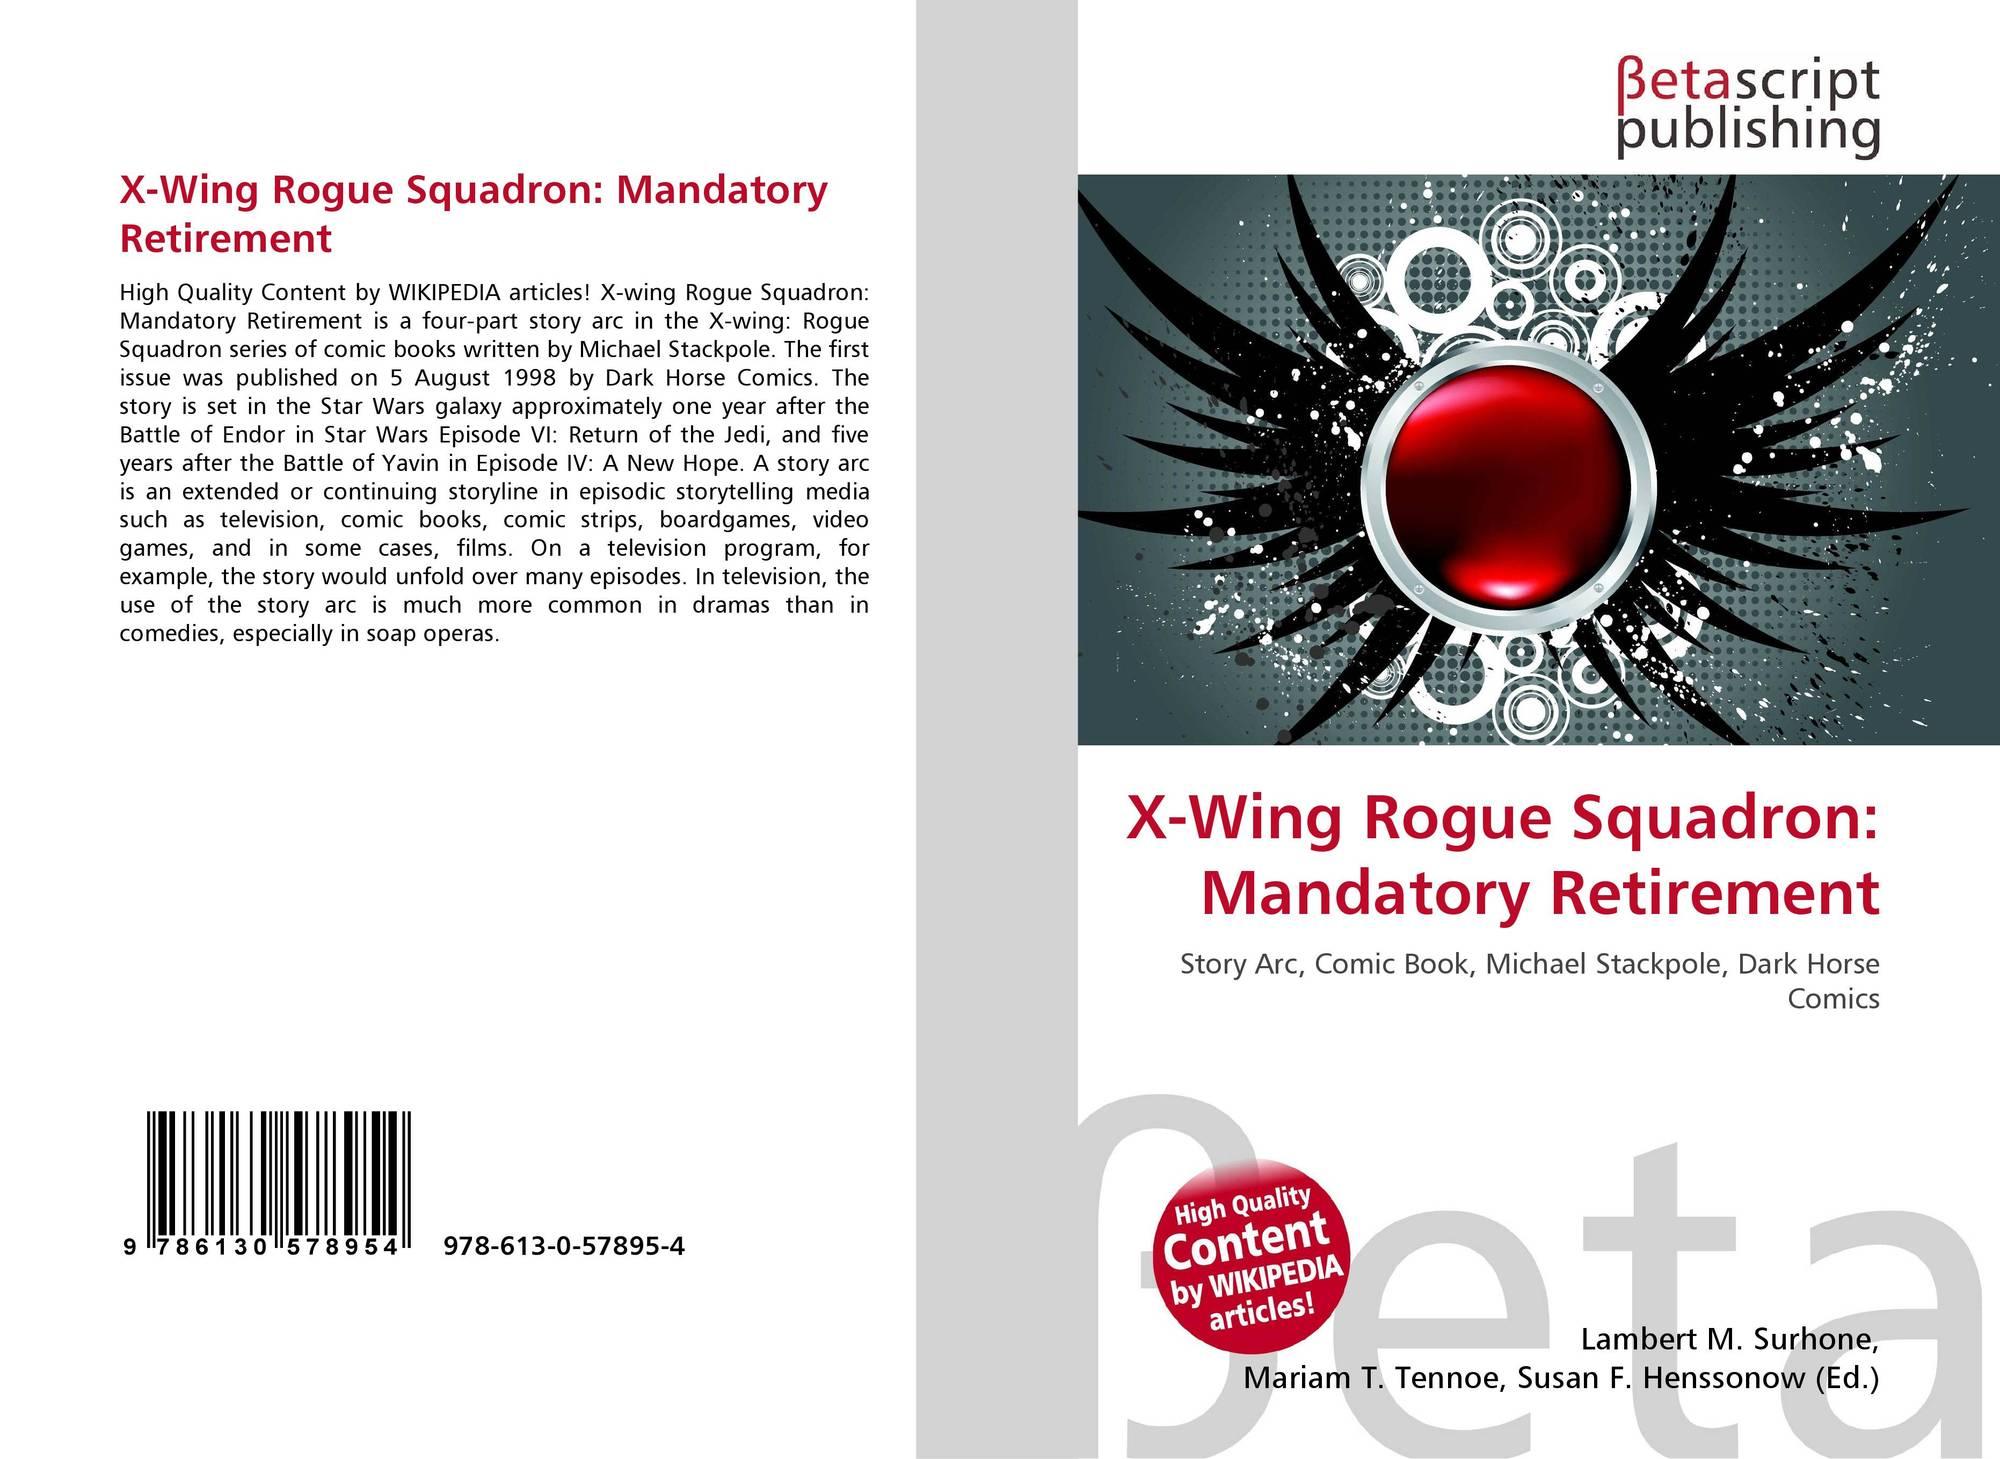 X-Wing Rogue Squadron: Mandatory Retirement, 978-613-0-57895